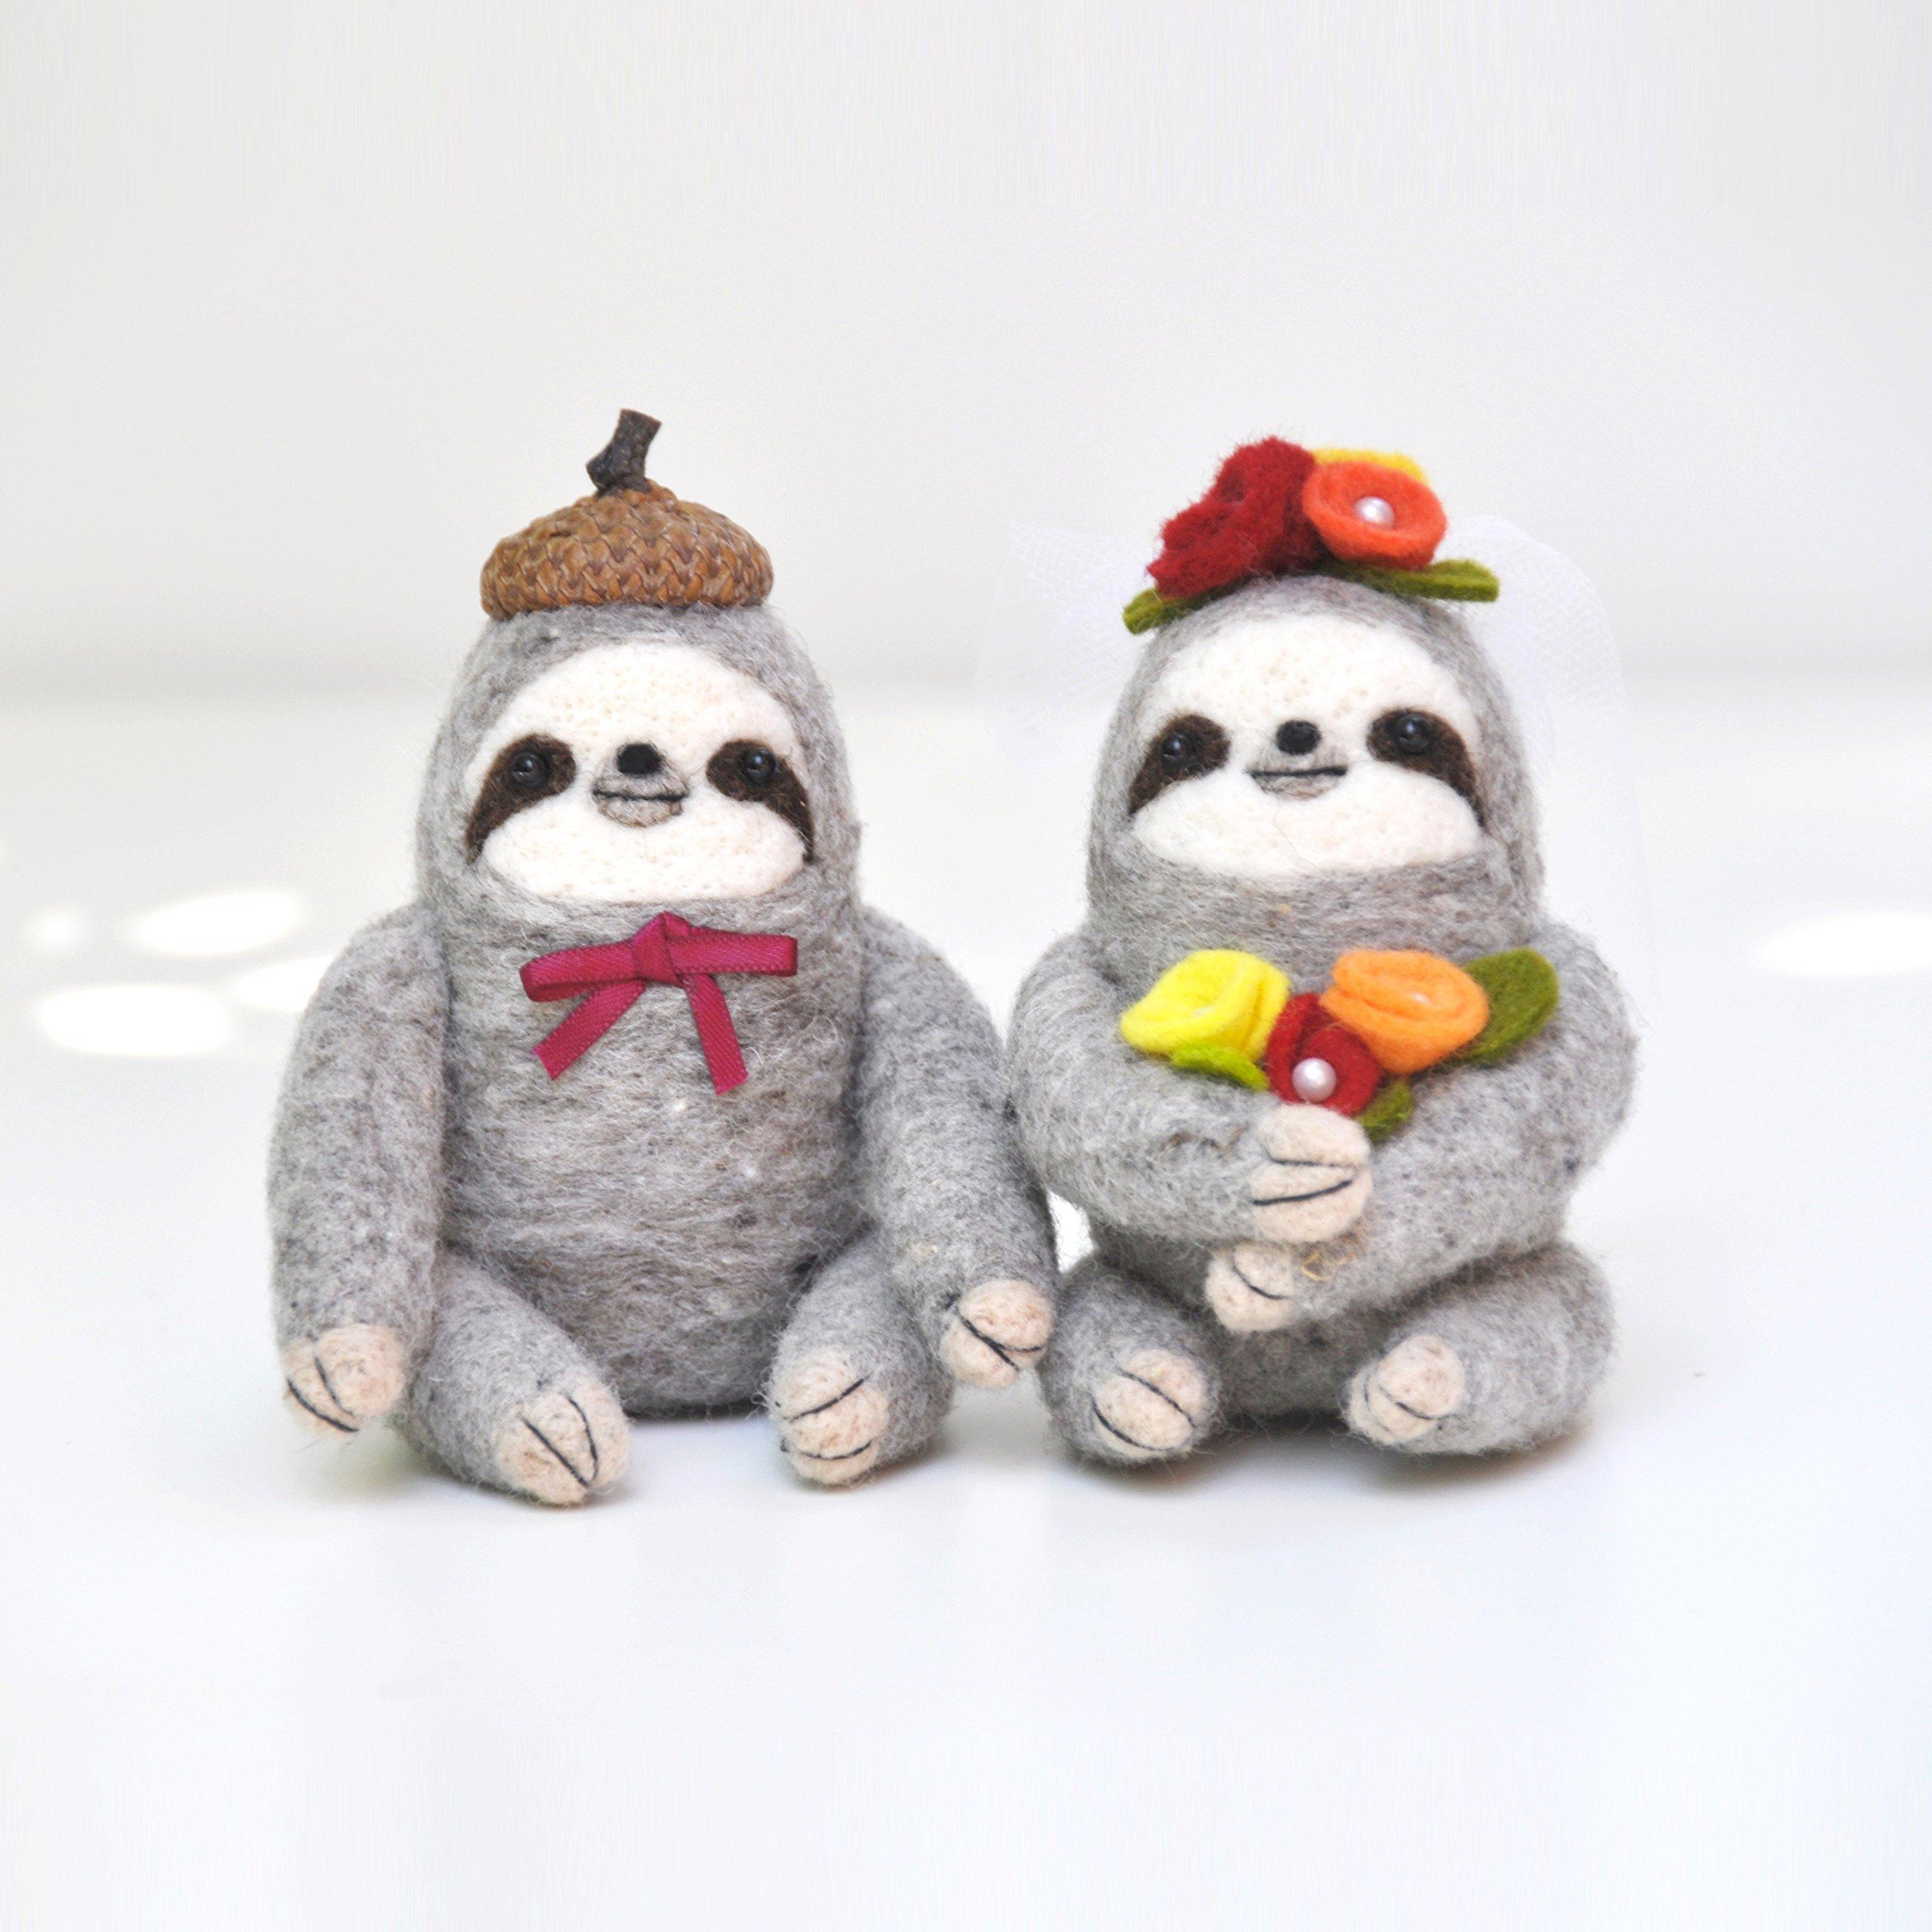 Needle felted Sloth Wedding Cake Topper, Sloth figurines, Sloth gift